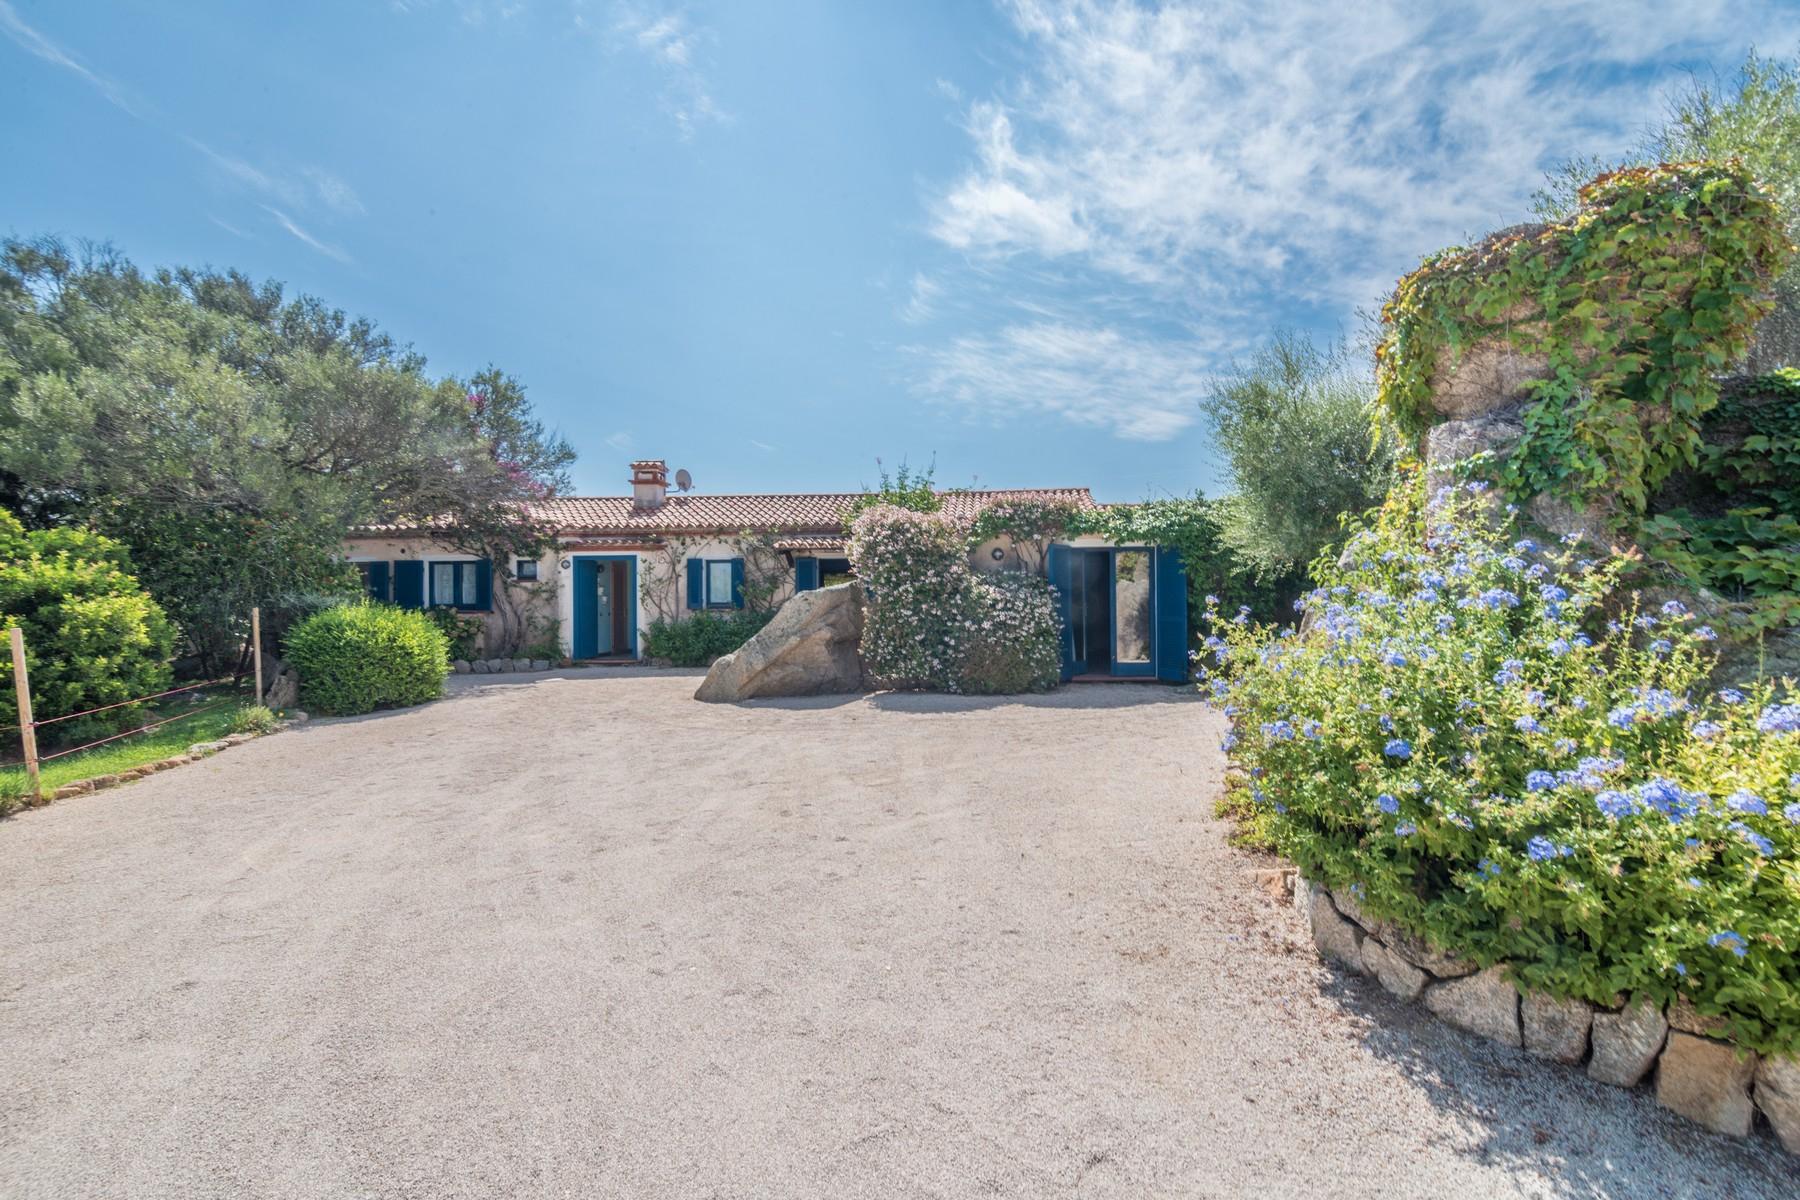 Casa indipendente in Vendita a Olbia: 5 locali, 230 mq - Foto 9